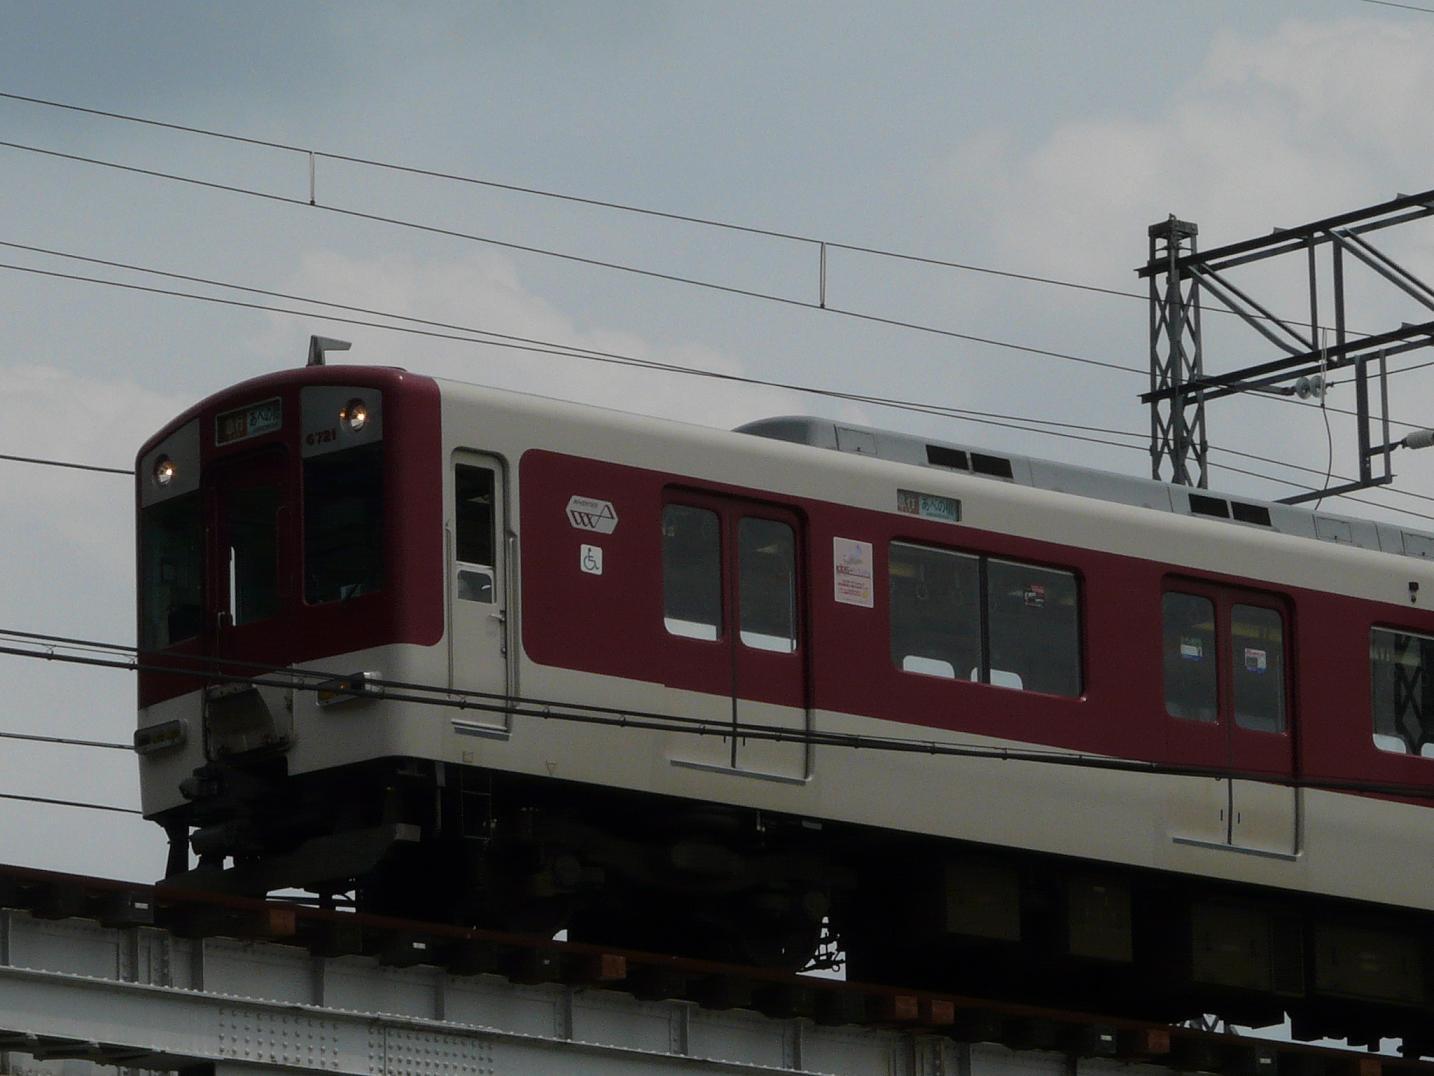 P1190840